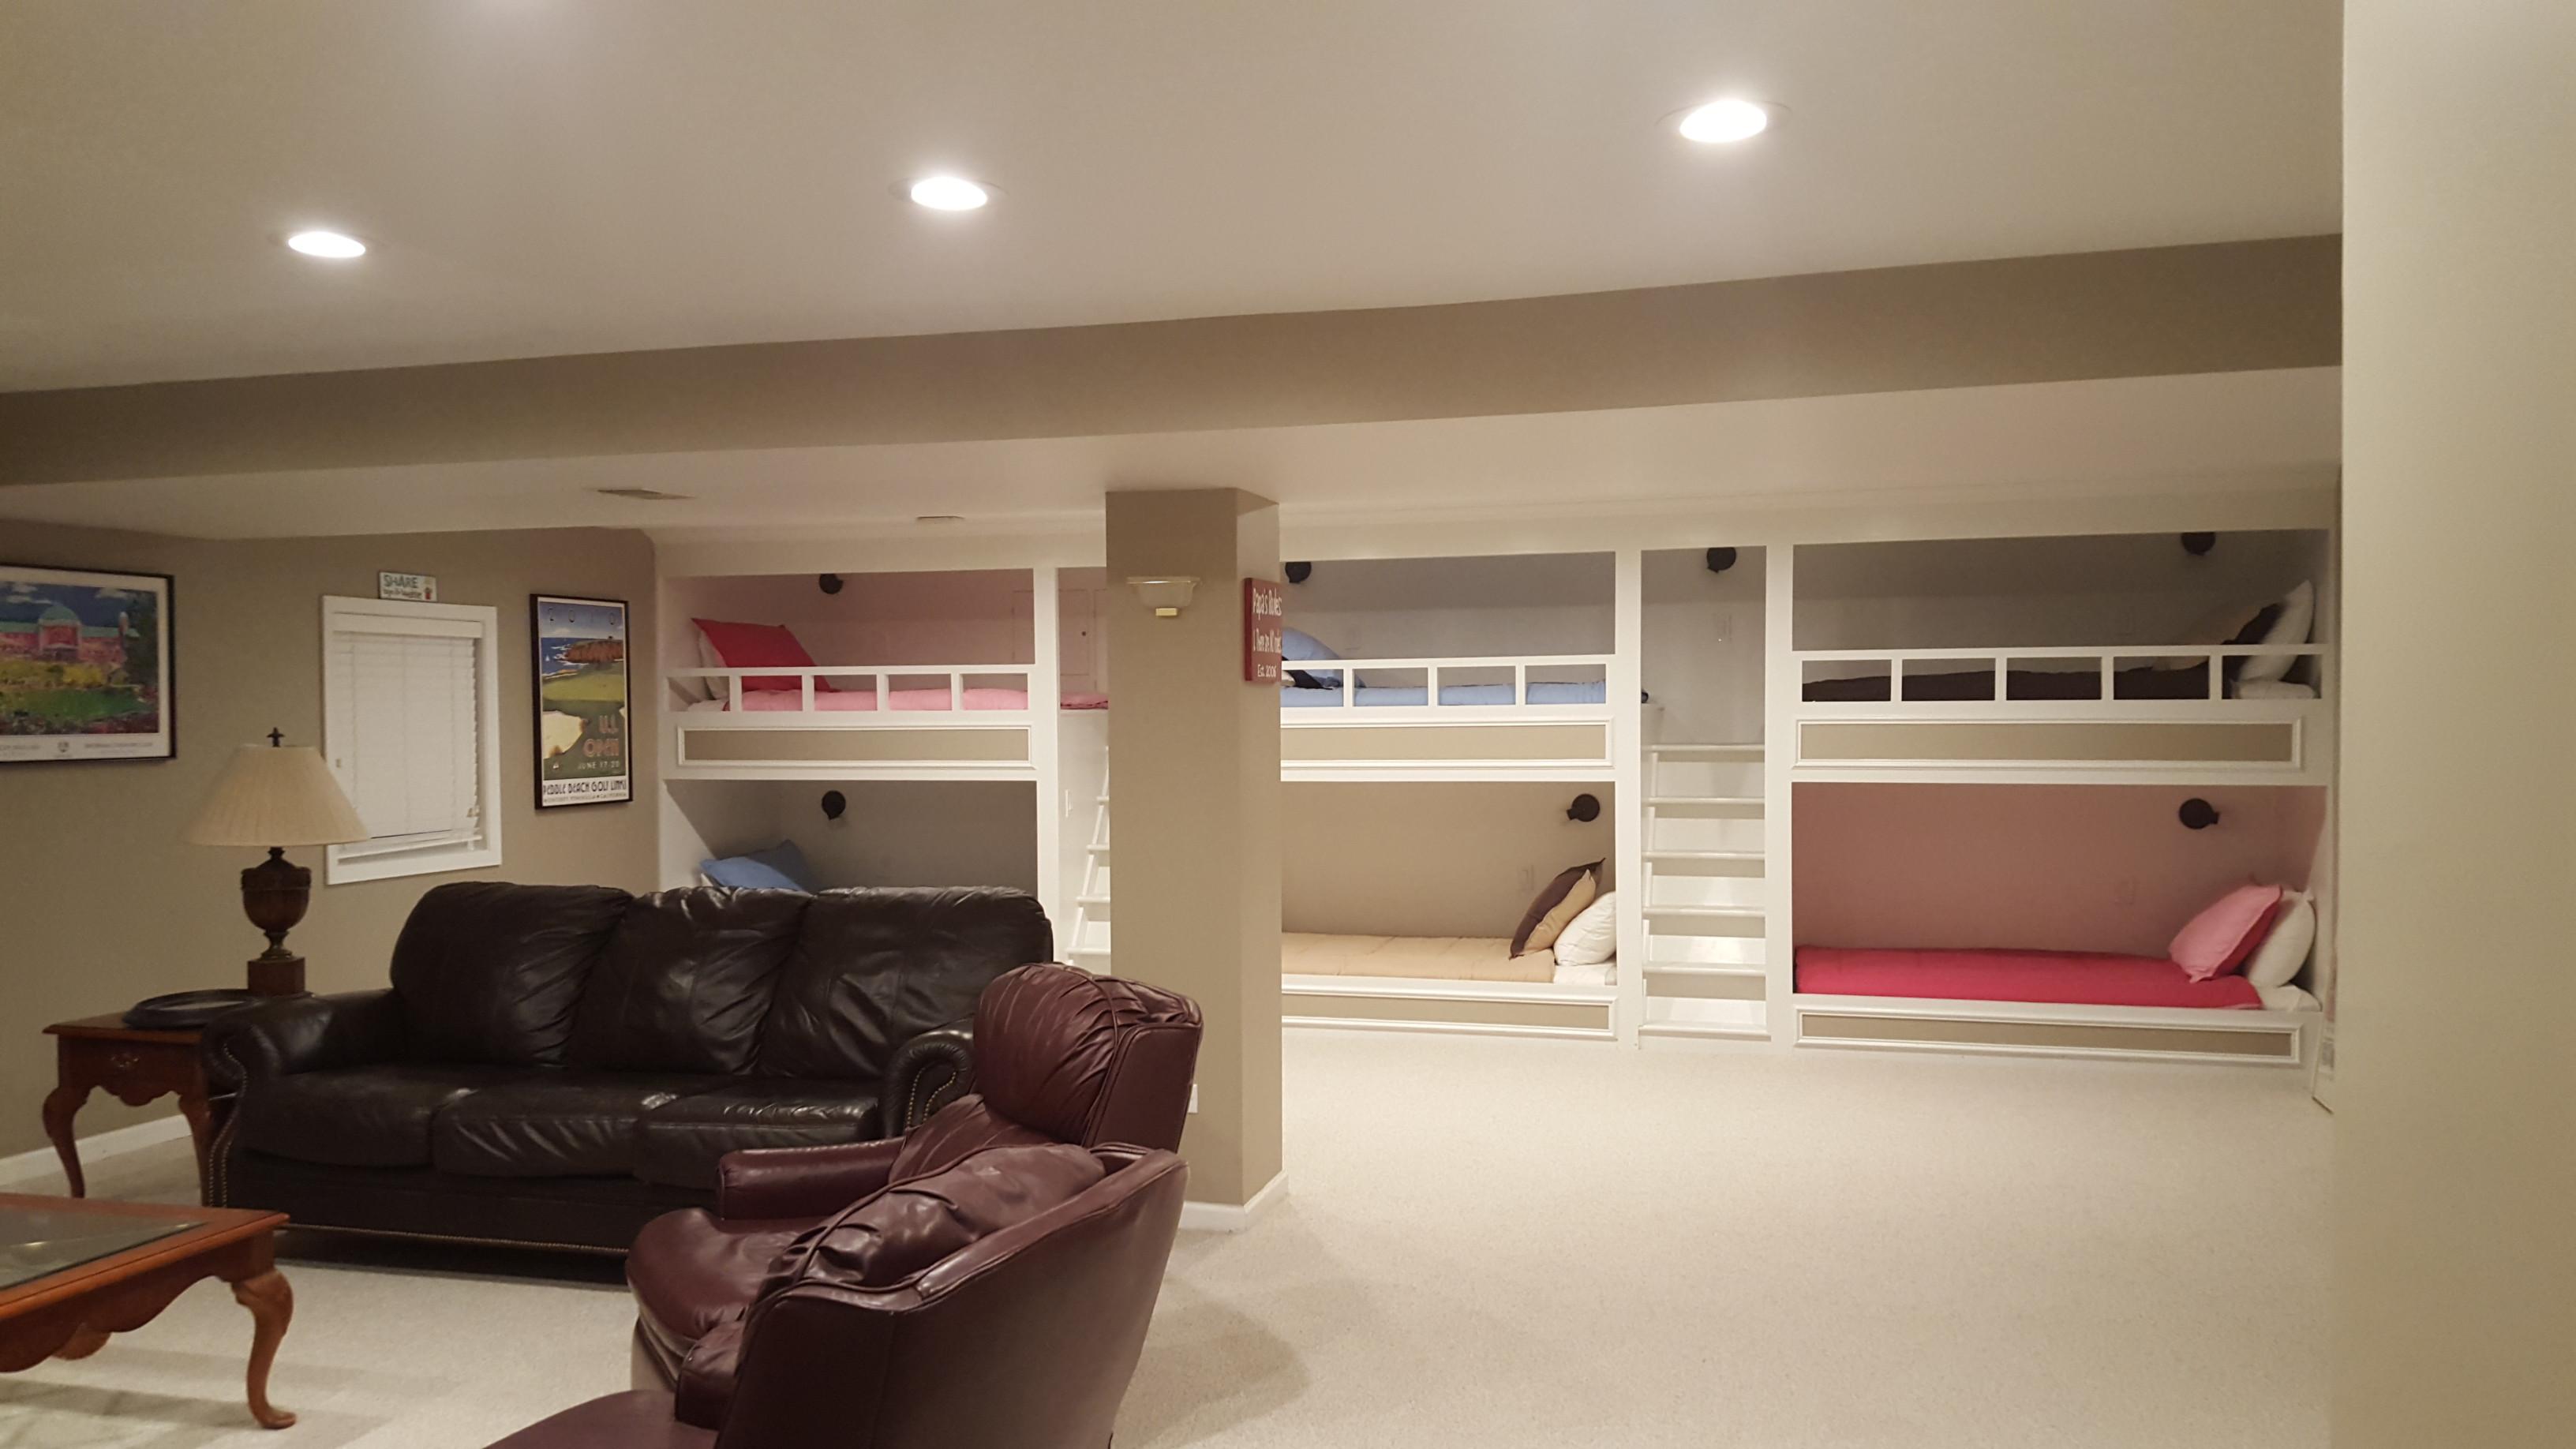 Best ideas about Remodel Basement Ideas . Save or Pin Some Great Basement Remodeling Ideas – Samanco Construction Now.